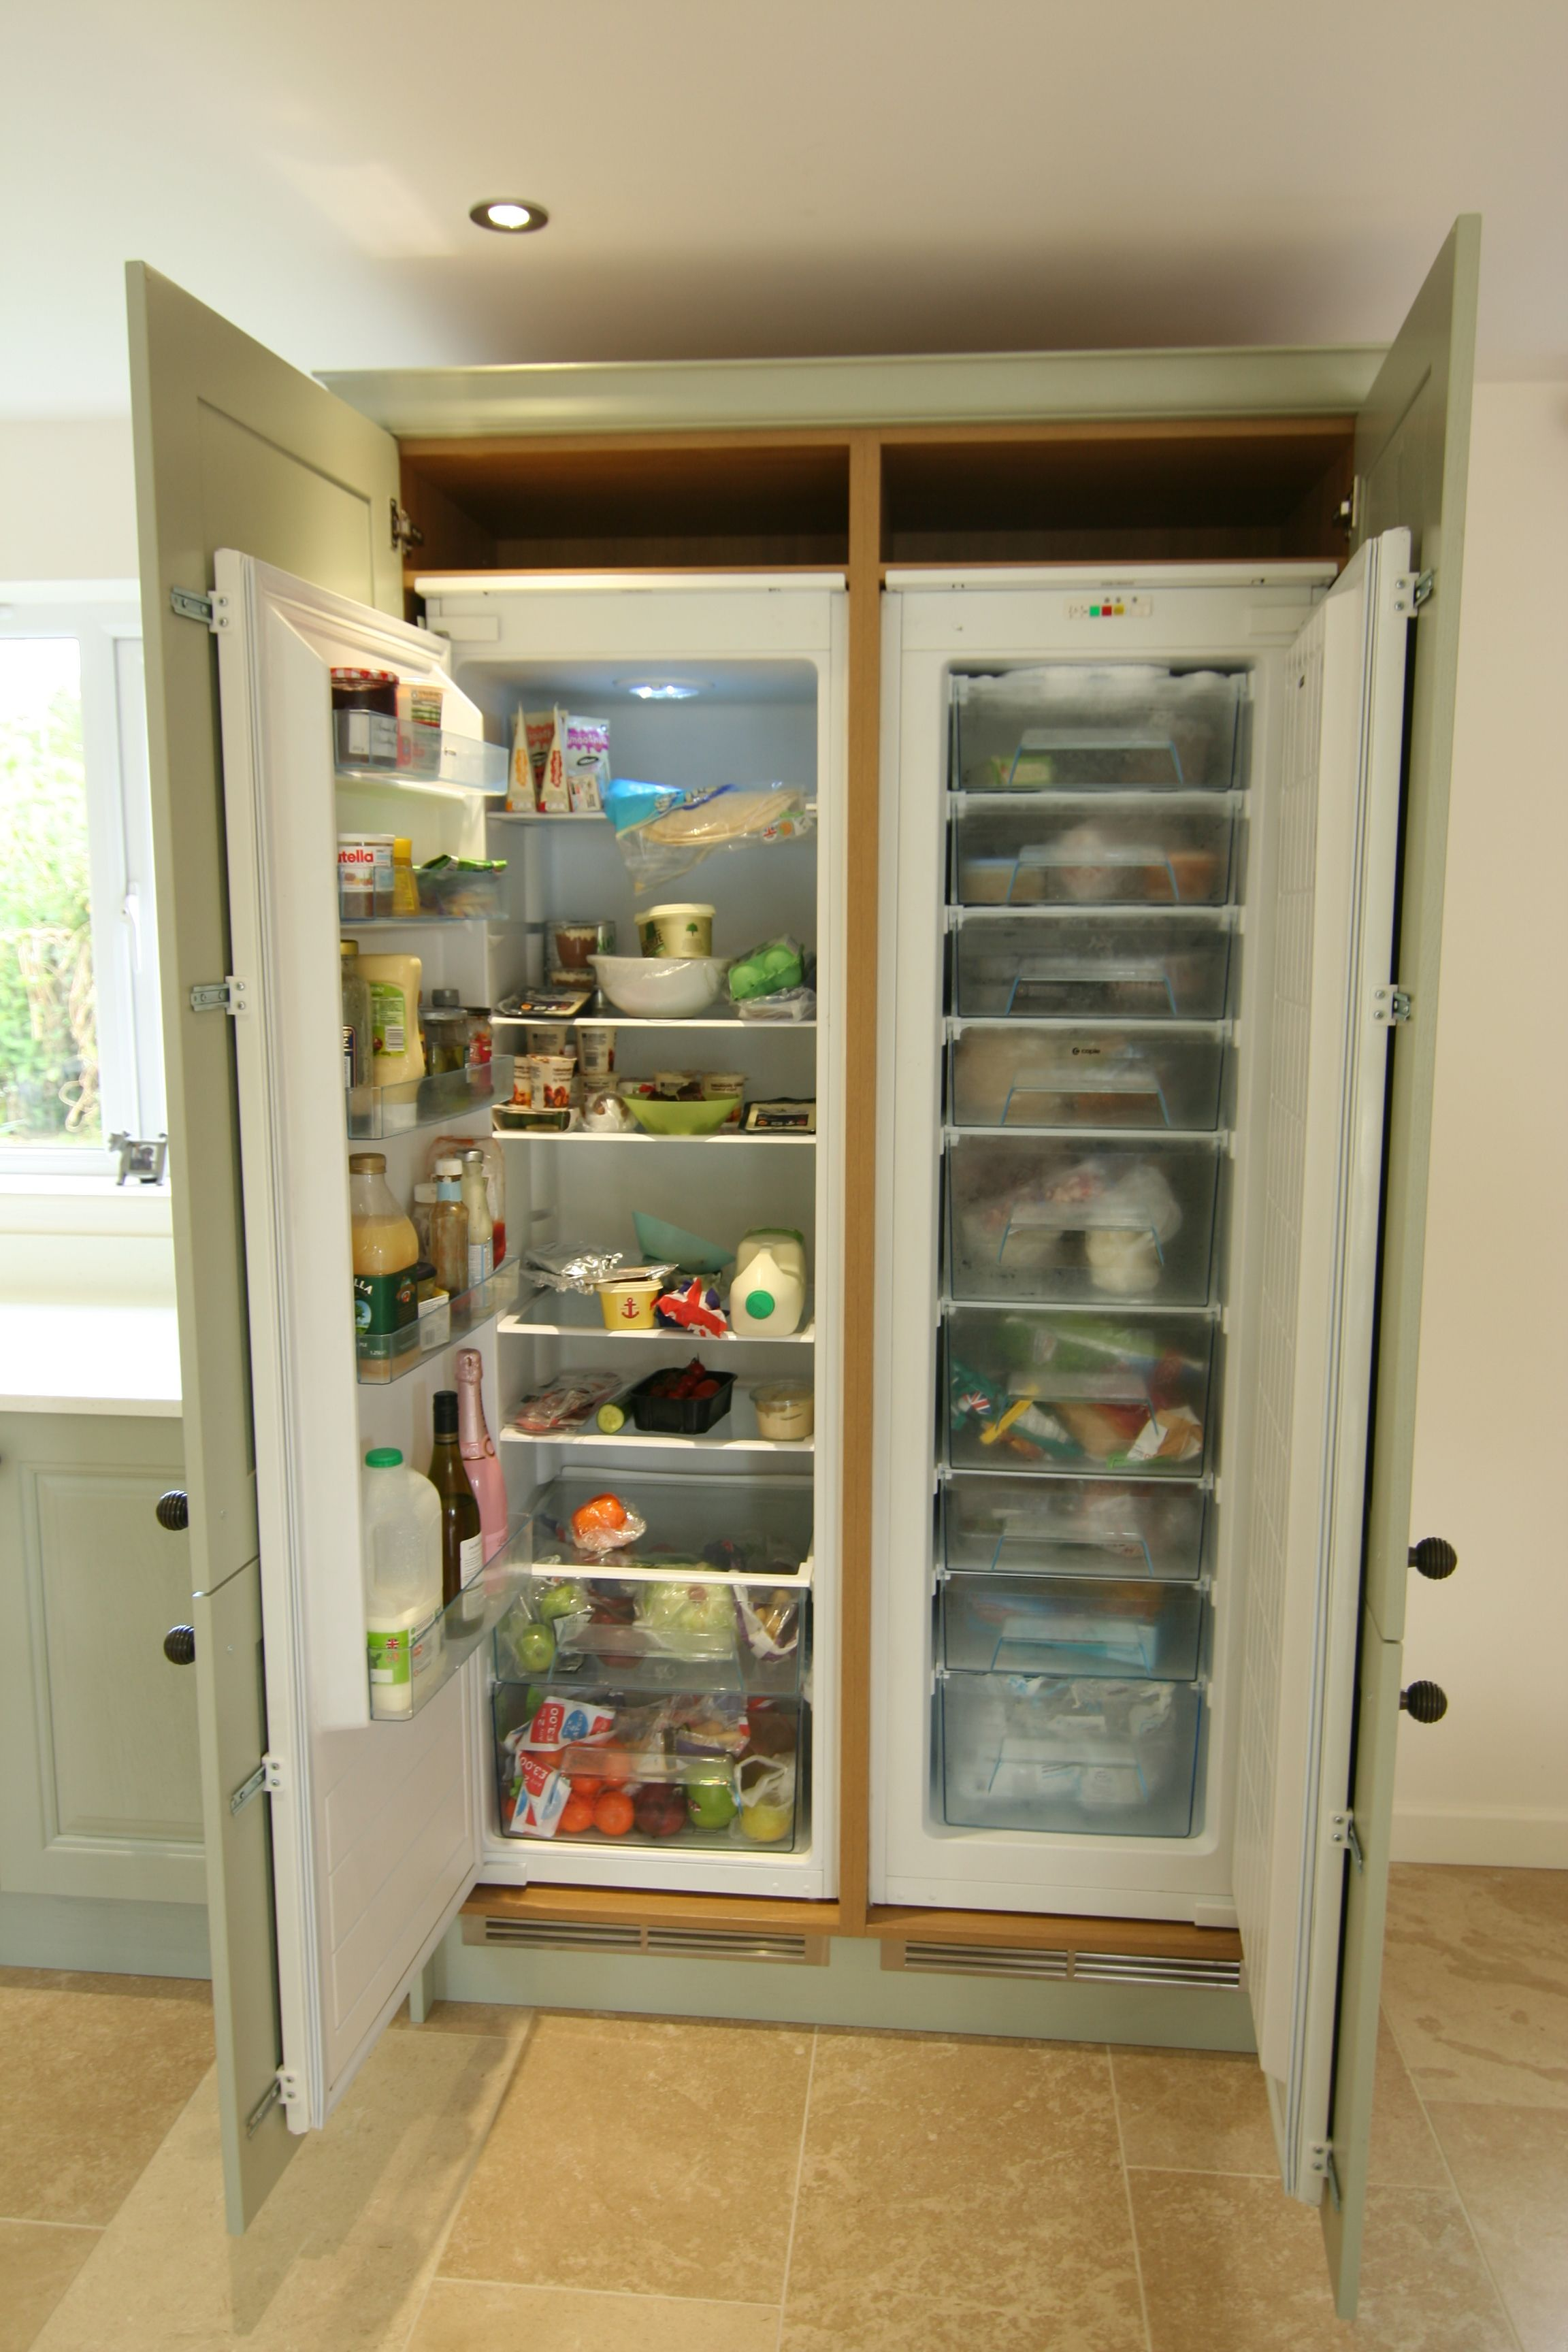 Tall Integrated Fridge & Freezer Integrated fridge, Tall